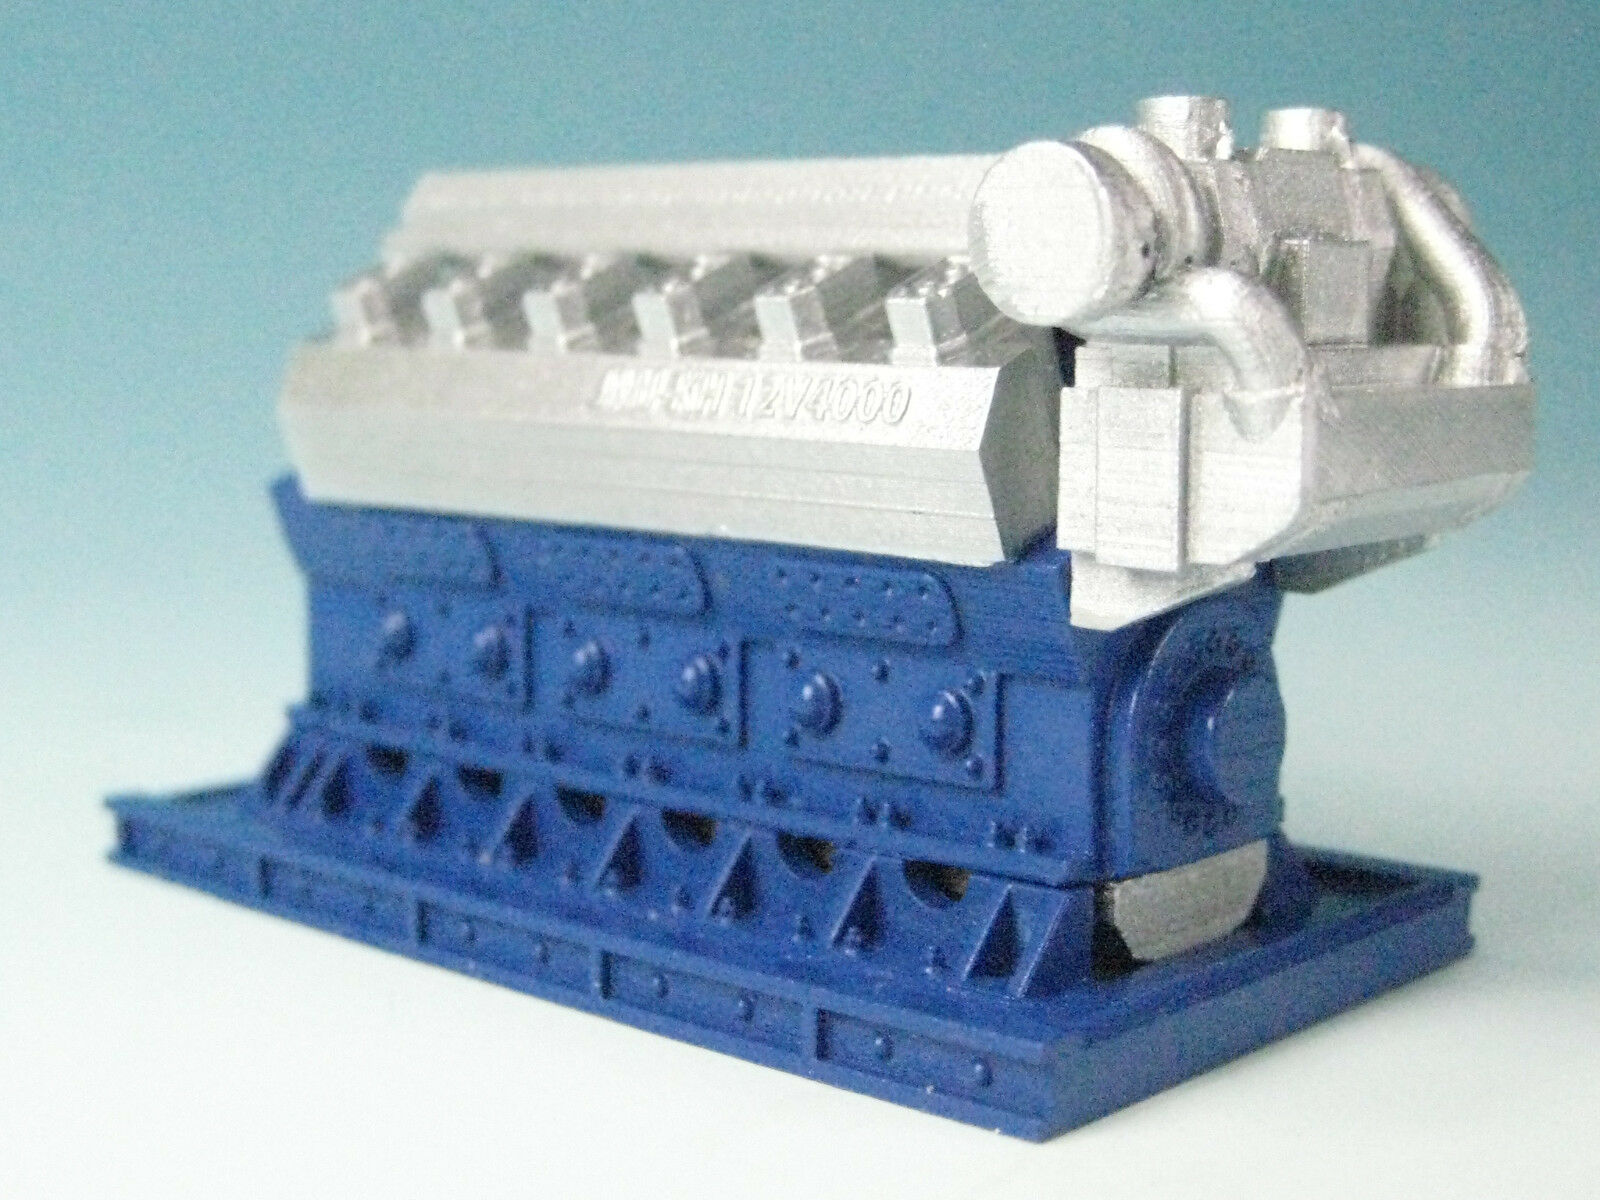 DUHA 11557 11557 11557 - Ladegut  Dieselmotor  (Spur H0)    Good Design  46bbc8